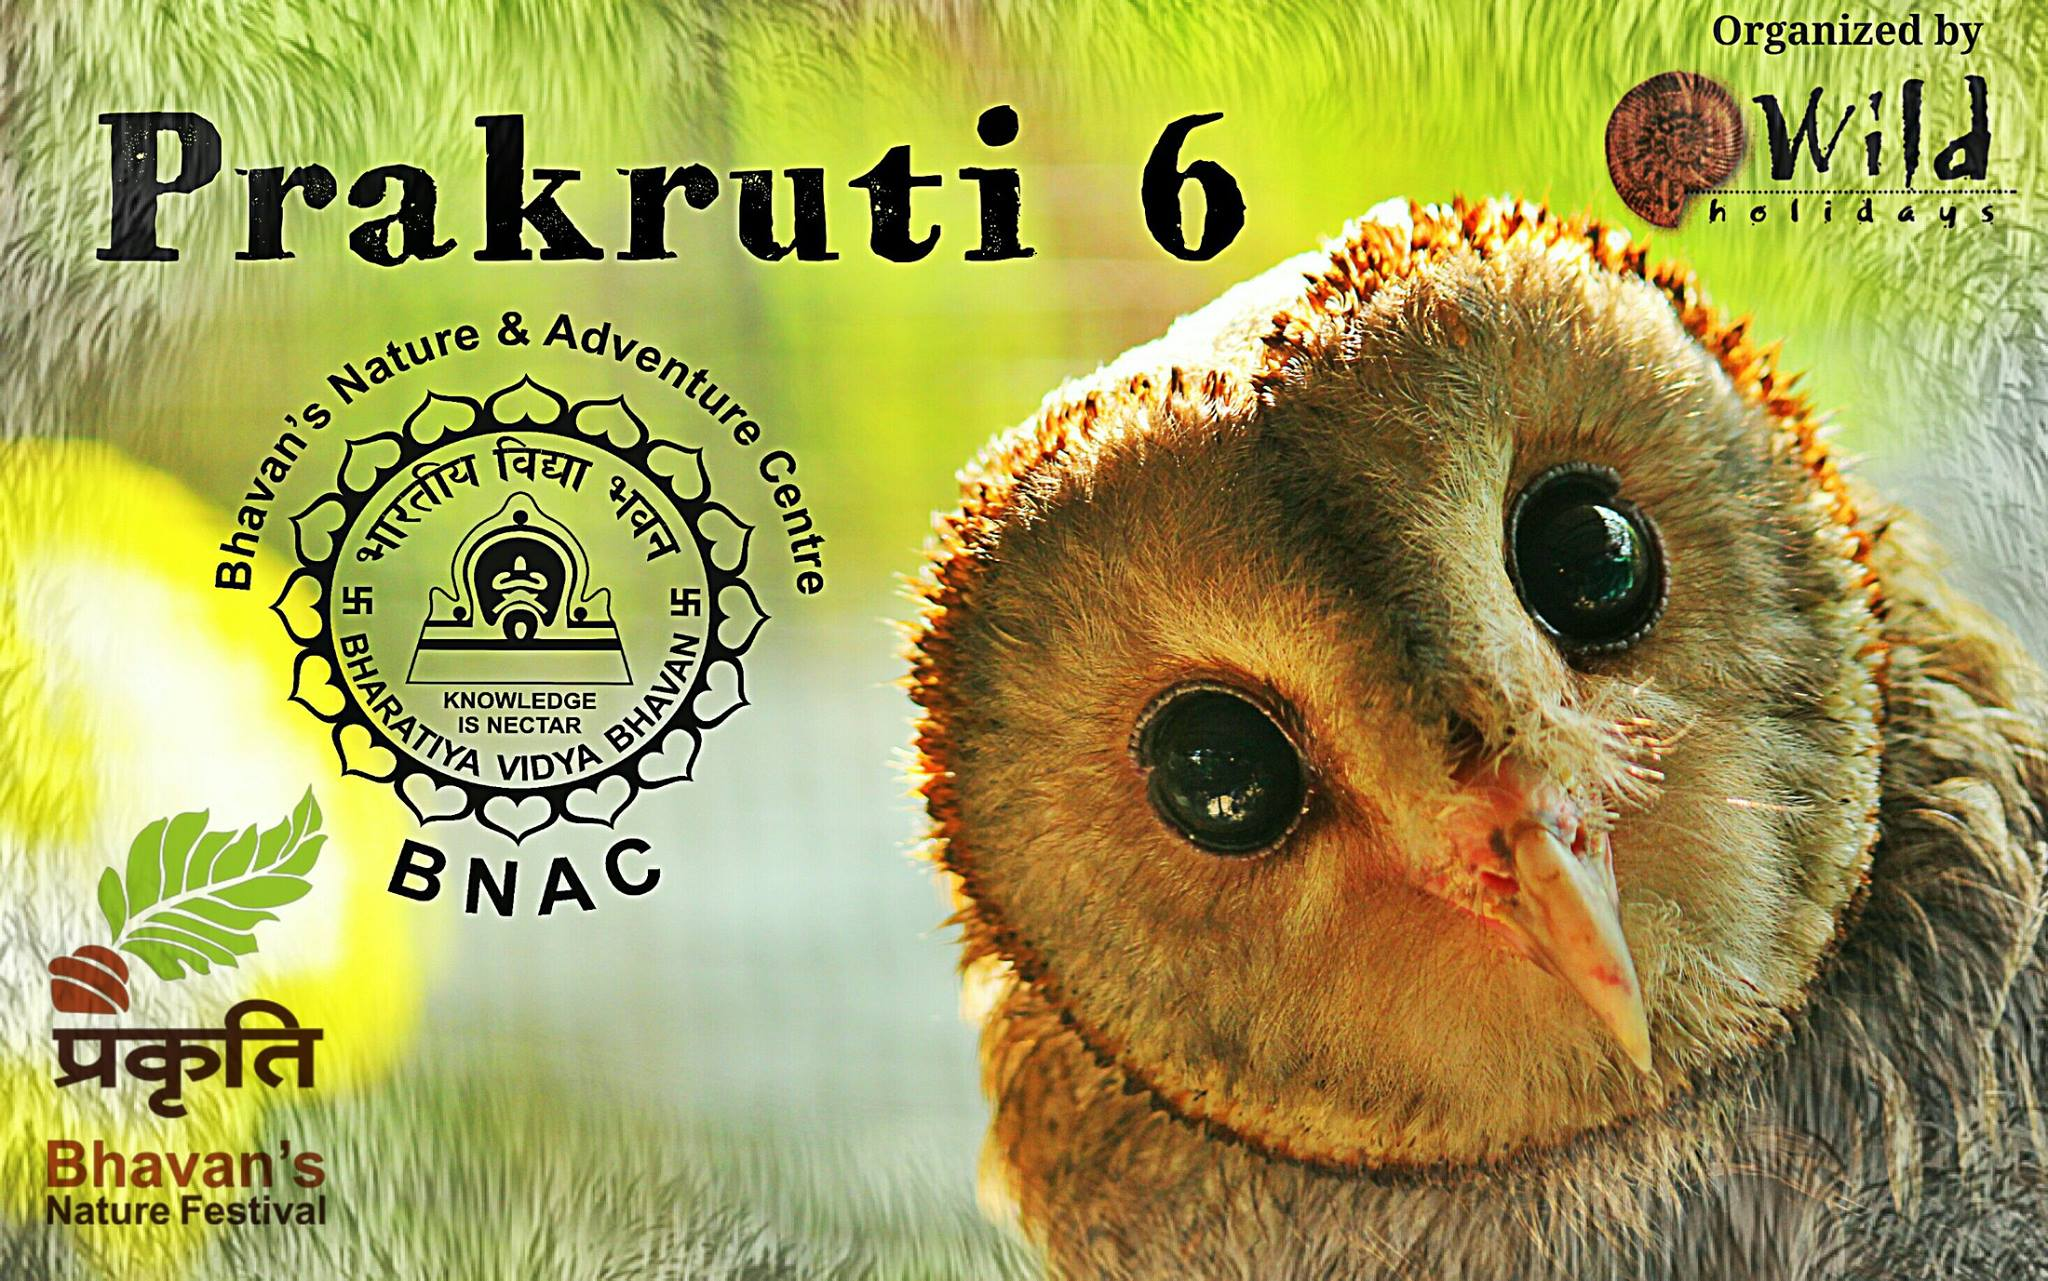 Prakruti Nature Festival